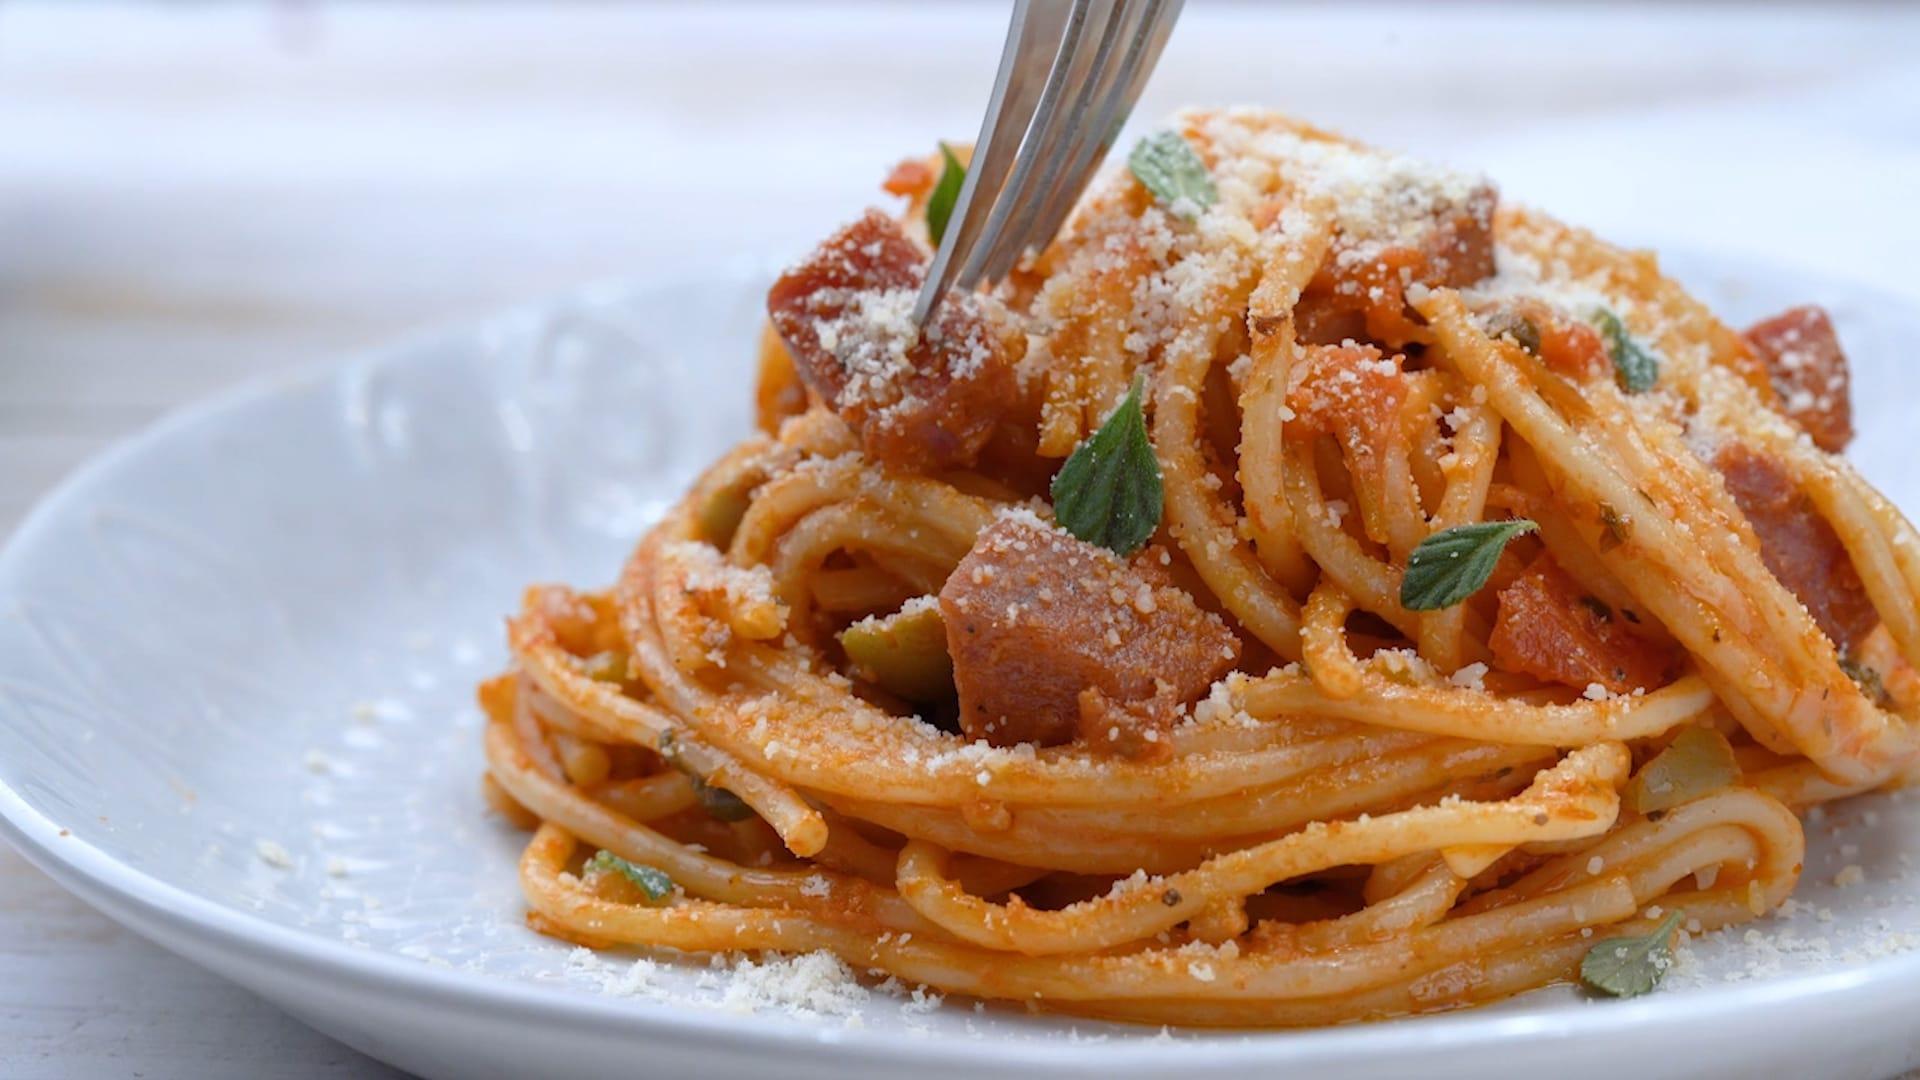 Serving spaghetti